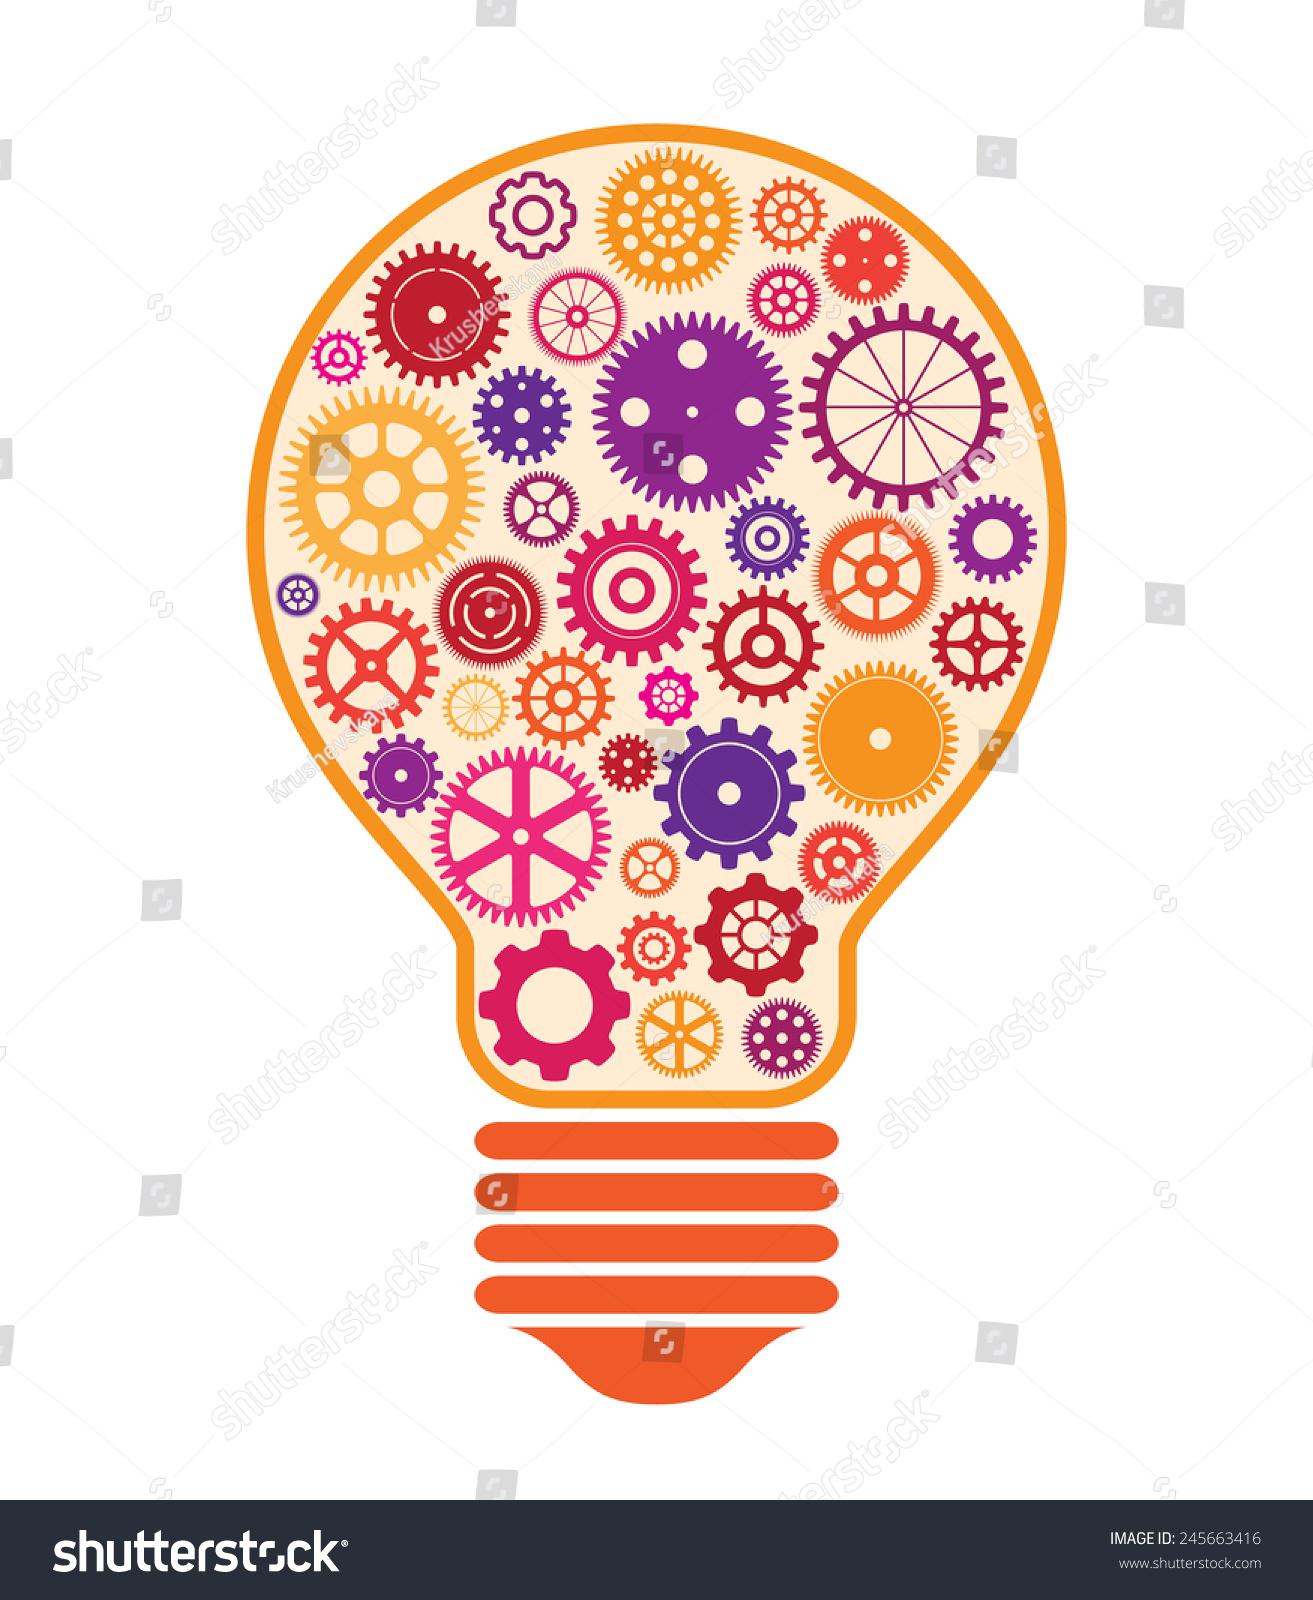 Illustration Light Bulb Made Colorful Cogwheels Stock Illustration ...